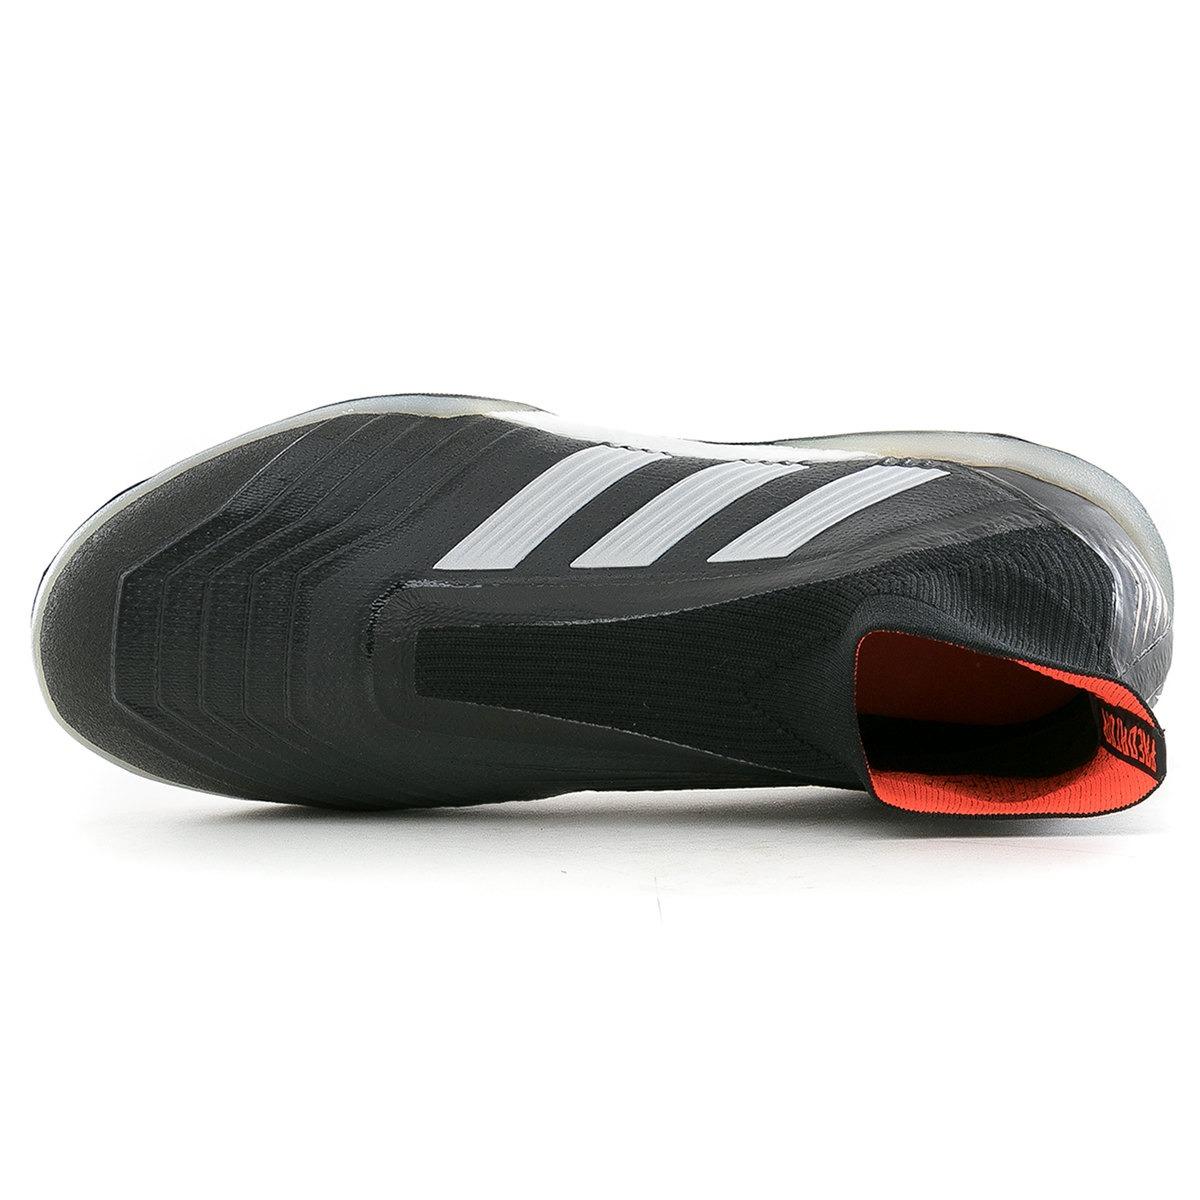 botines predator tango 18+ negro adidas. Cargando zoom. be4f75637fe28